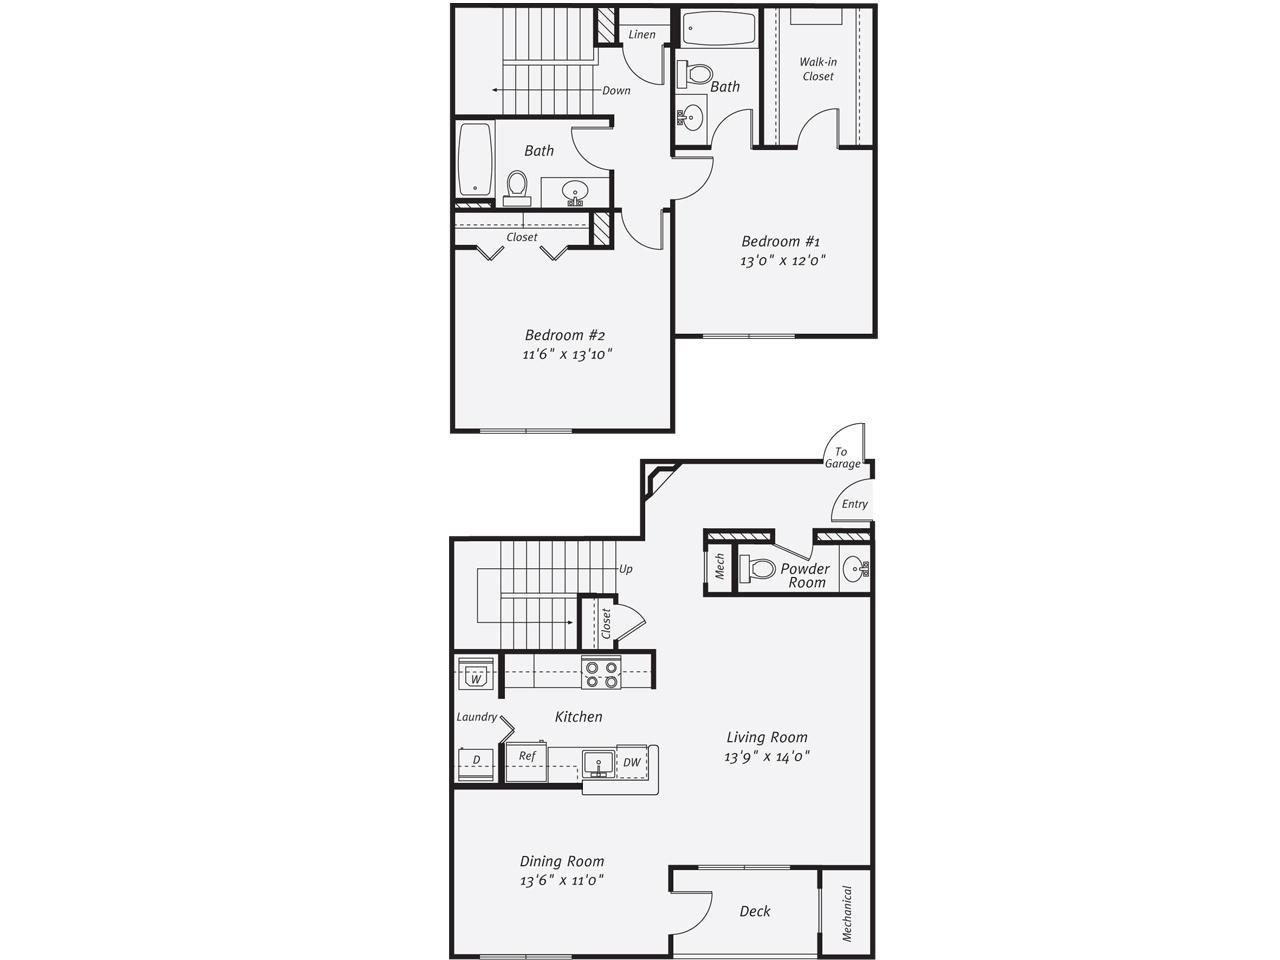 Ny coram thepointatpineridge p0571769 ny014 bt8g 2 floorplan